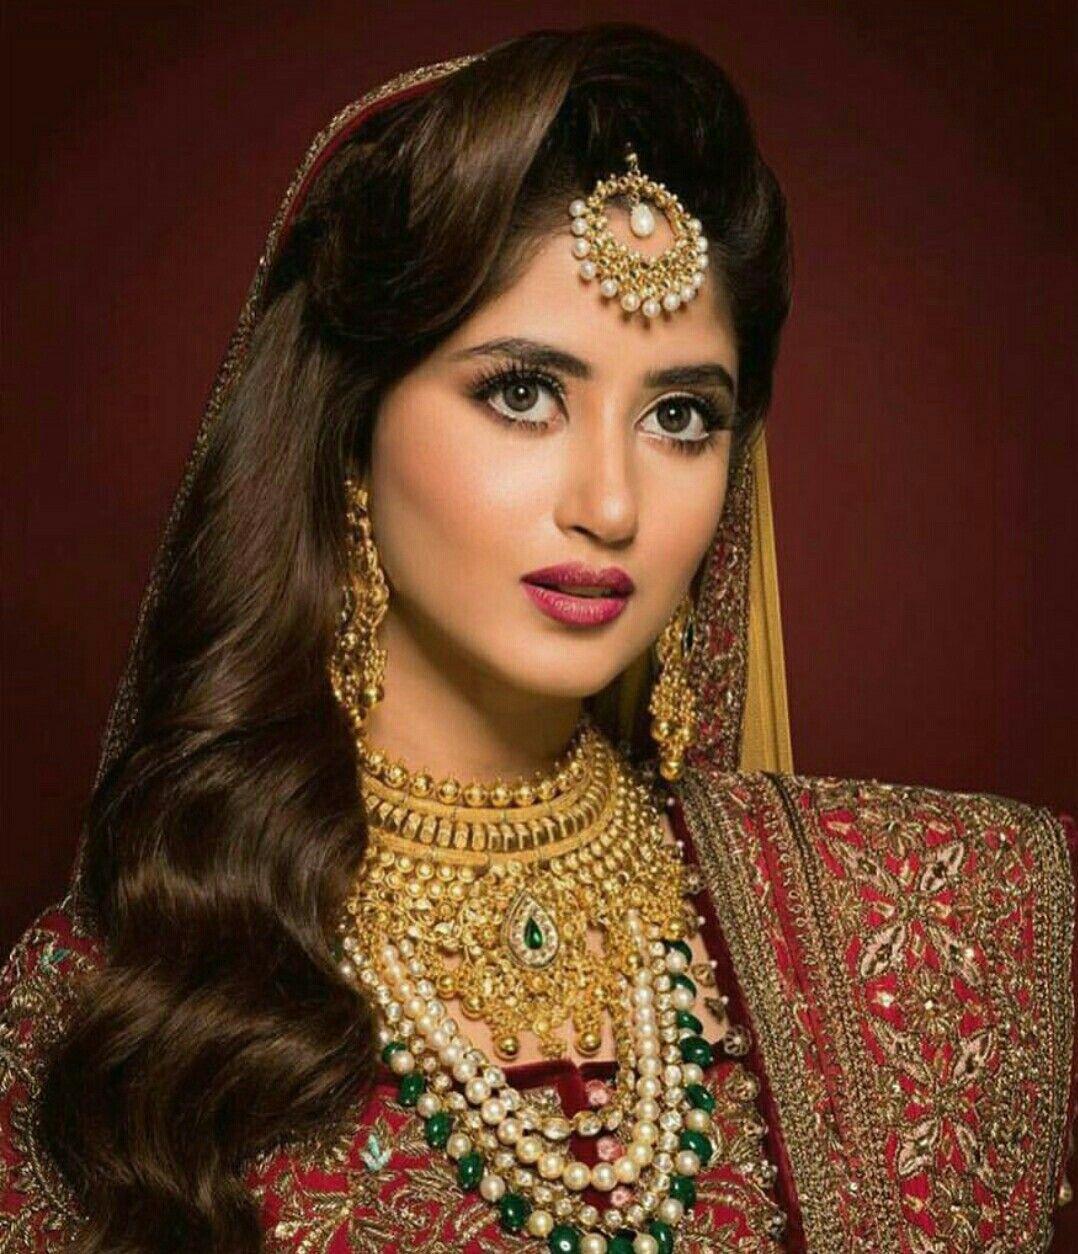 Sajal ali   Pakistani fashion   Pinterest   Pakistanisch und Brautkleid